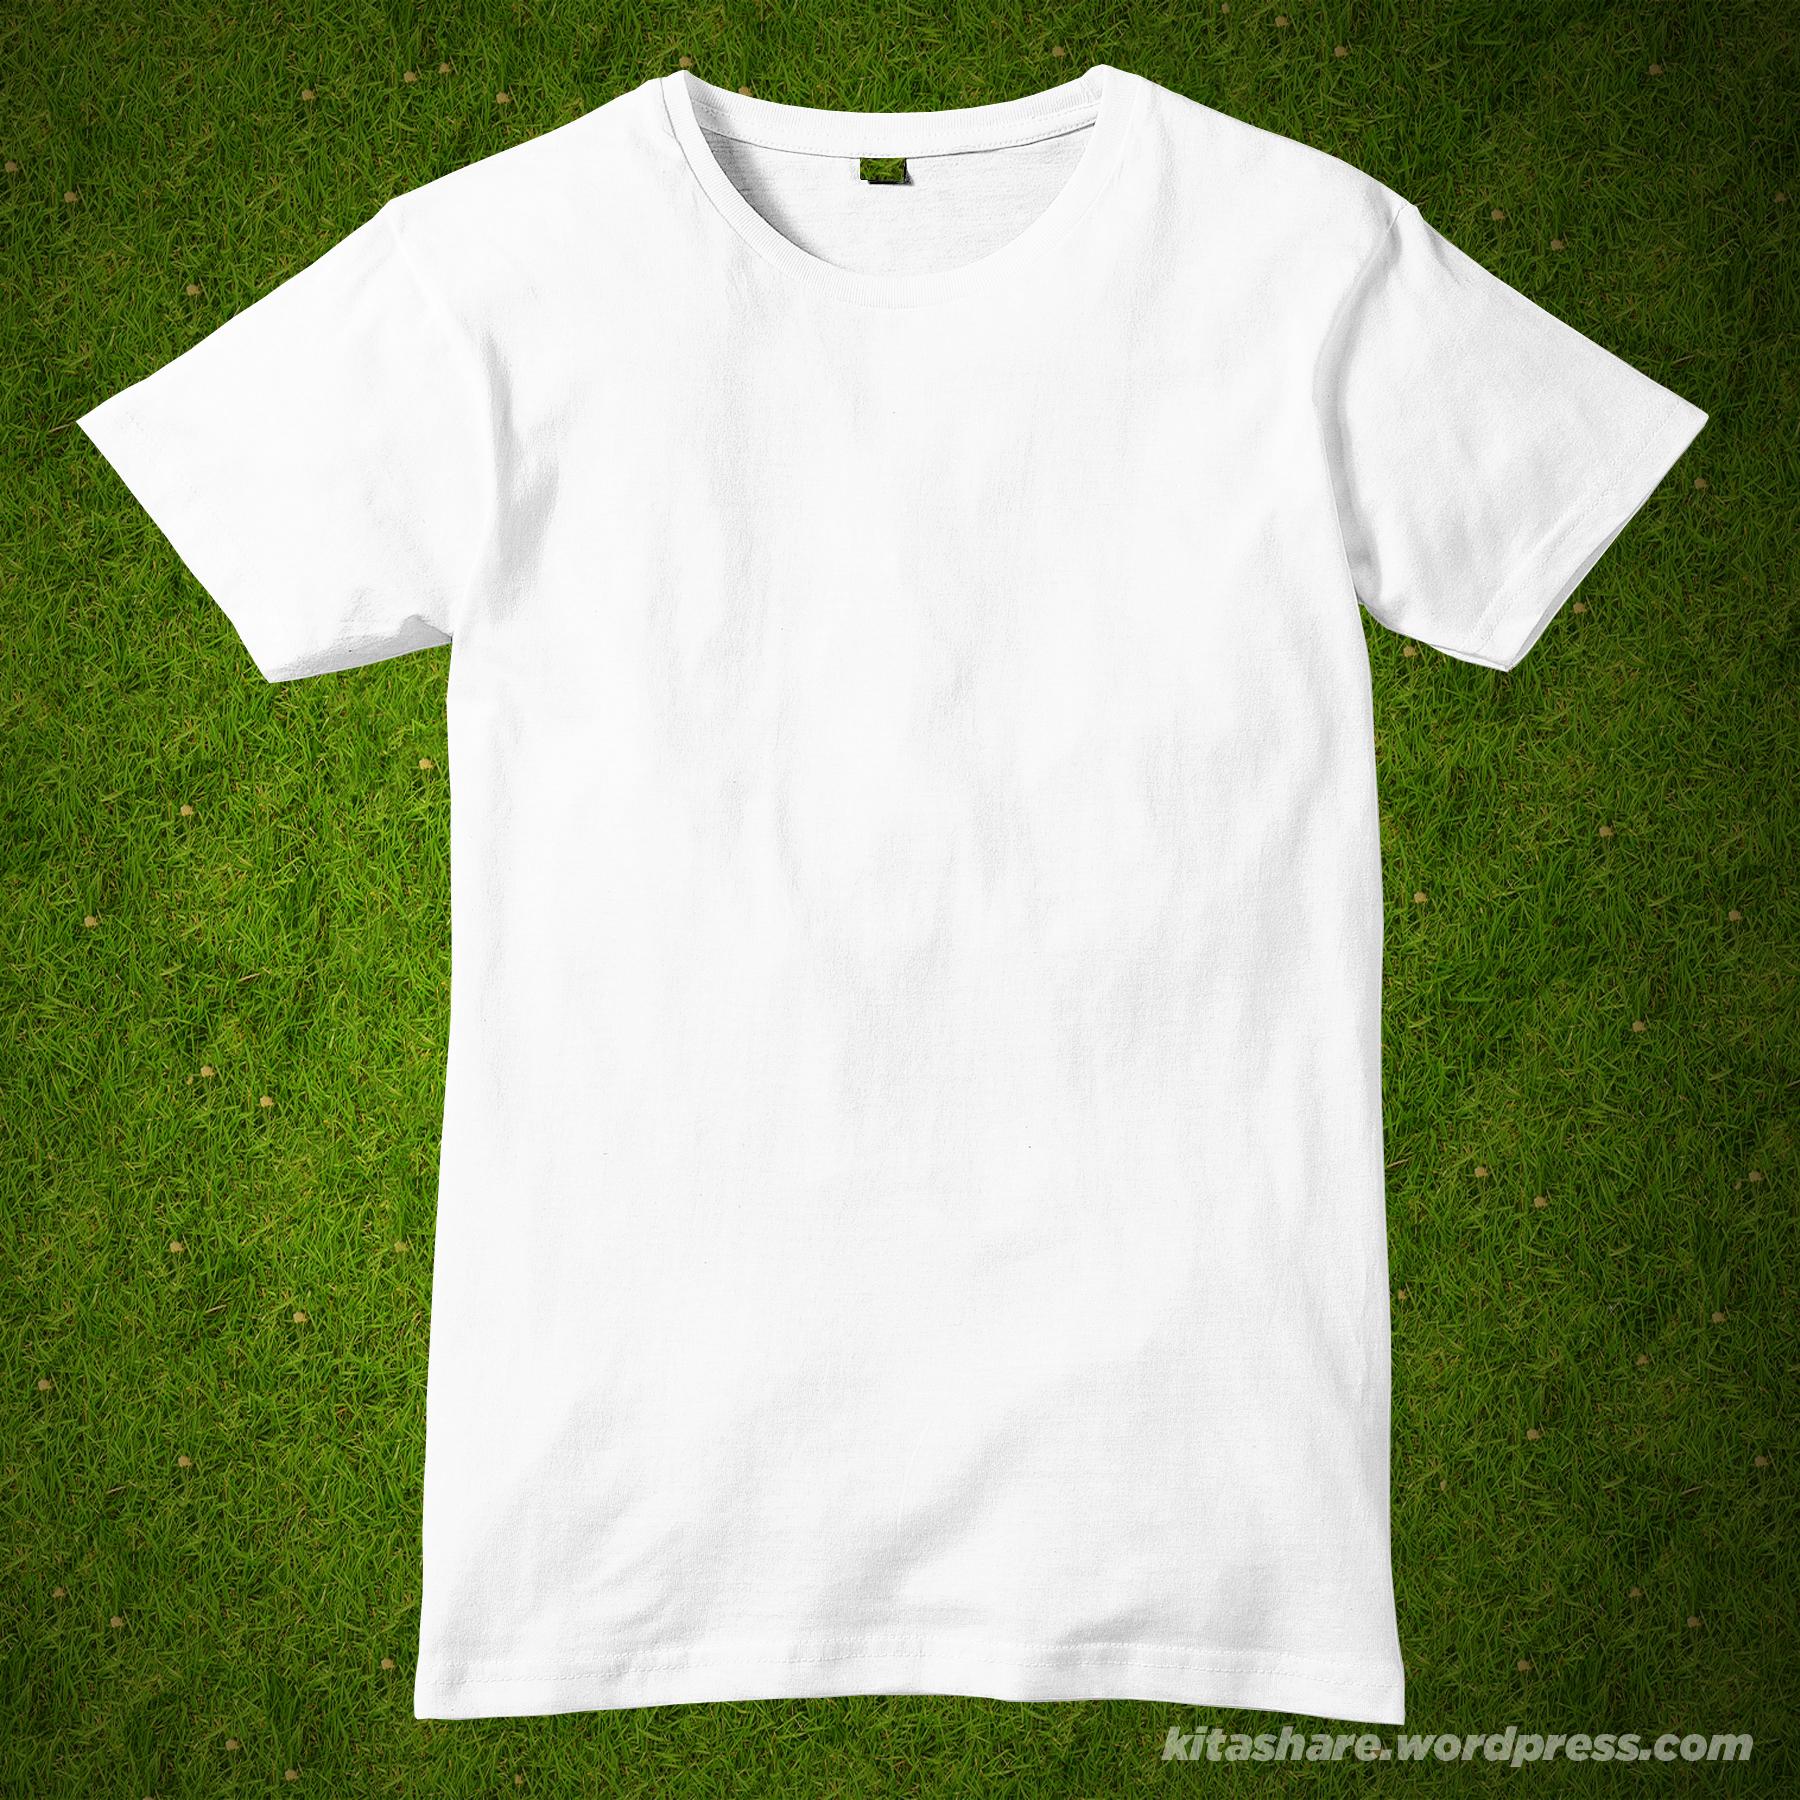 kumpulan mock up t shirt free mari kitashare